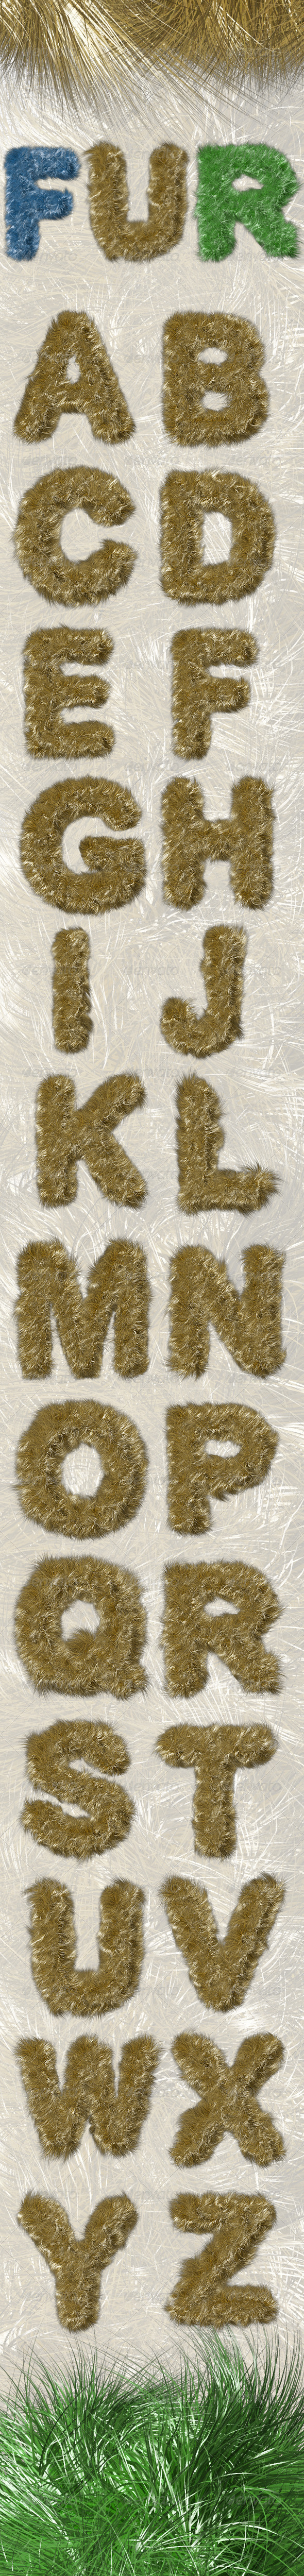 Fur Alphabet - Text 3D Renders